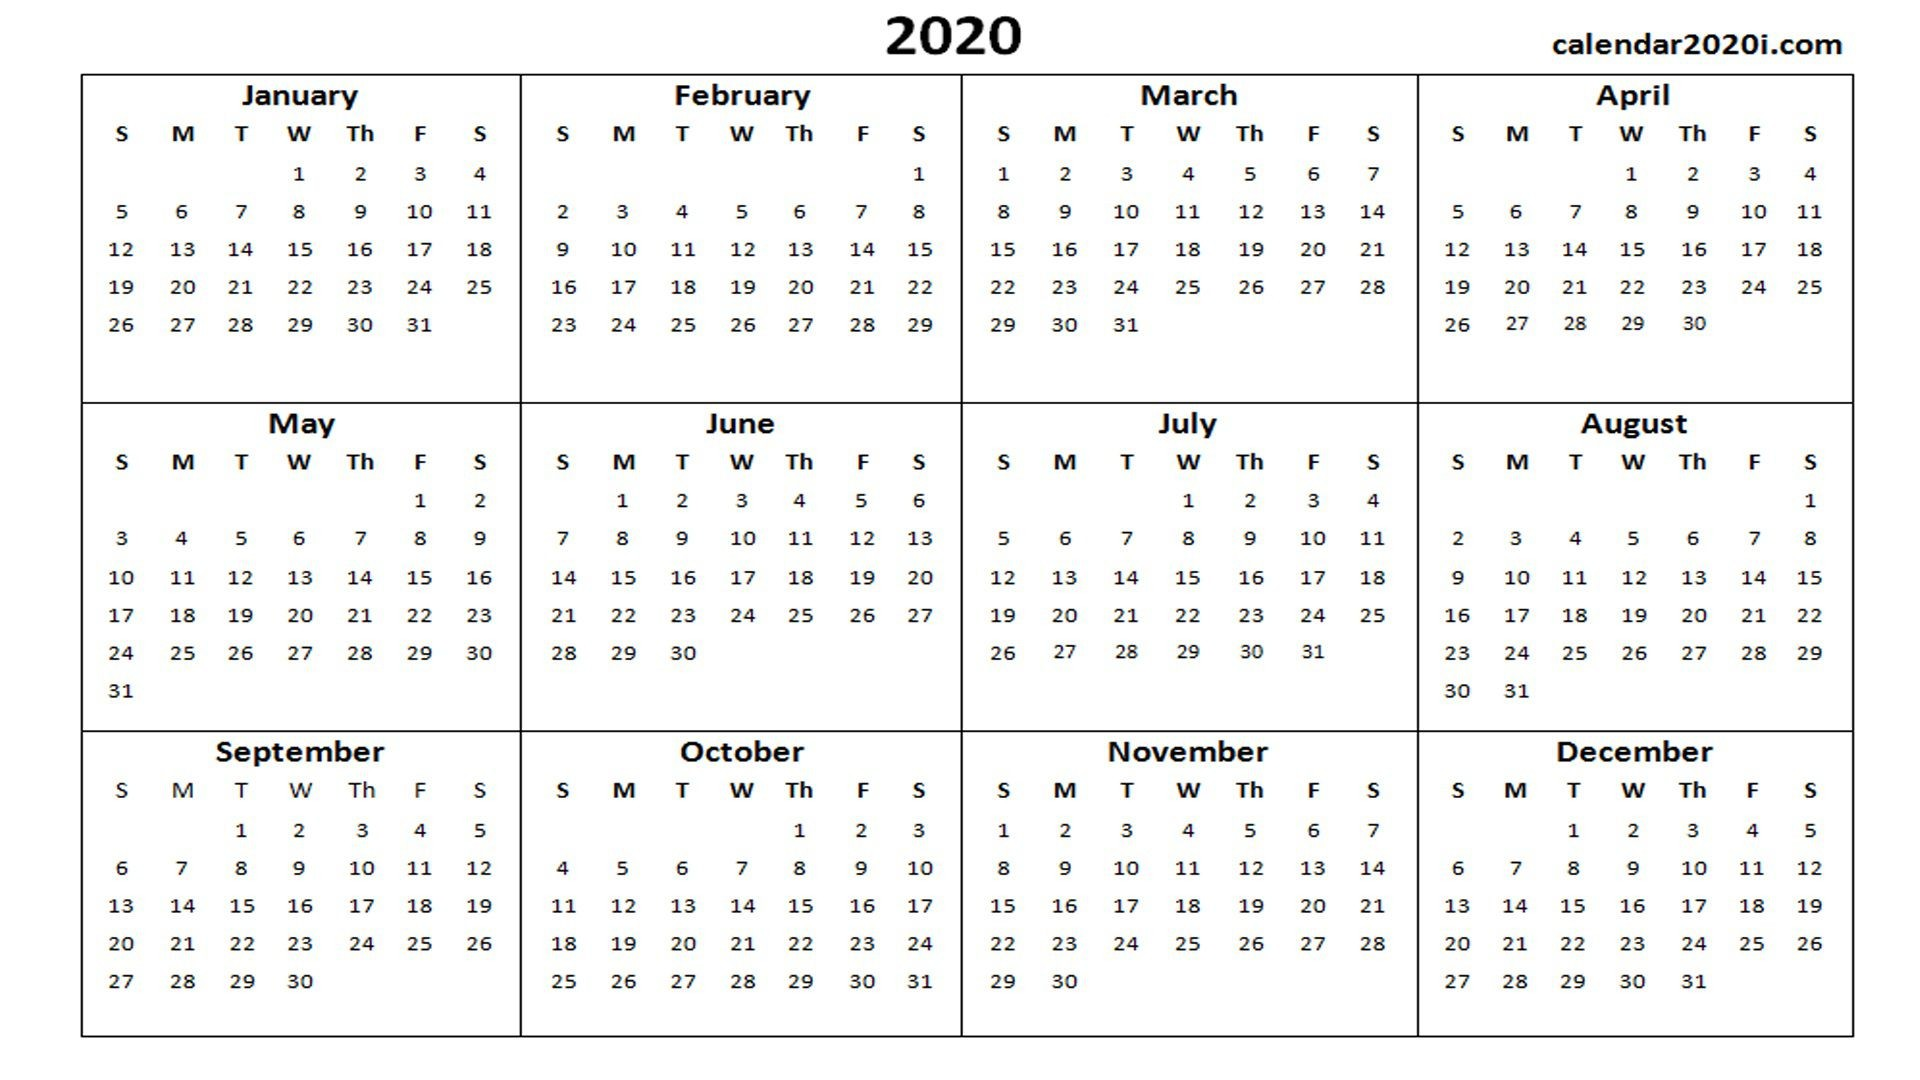 002 Unusual Microsoft Calendar Template 2020 Concept  Publisher Office Free1920